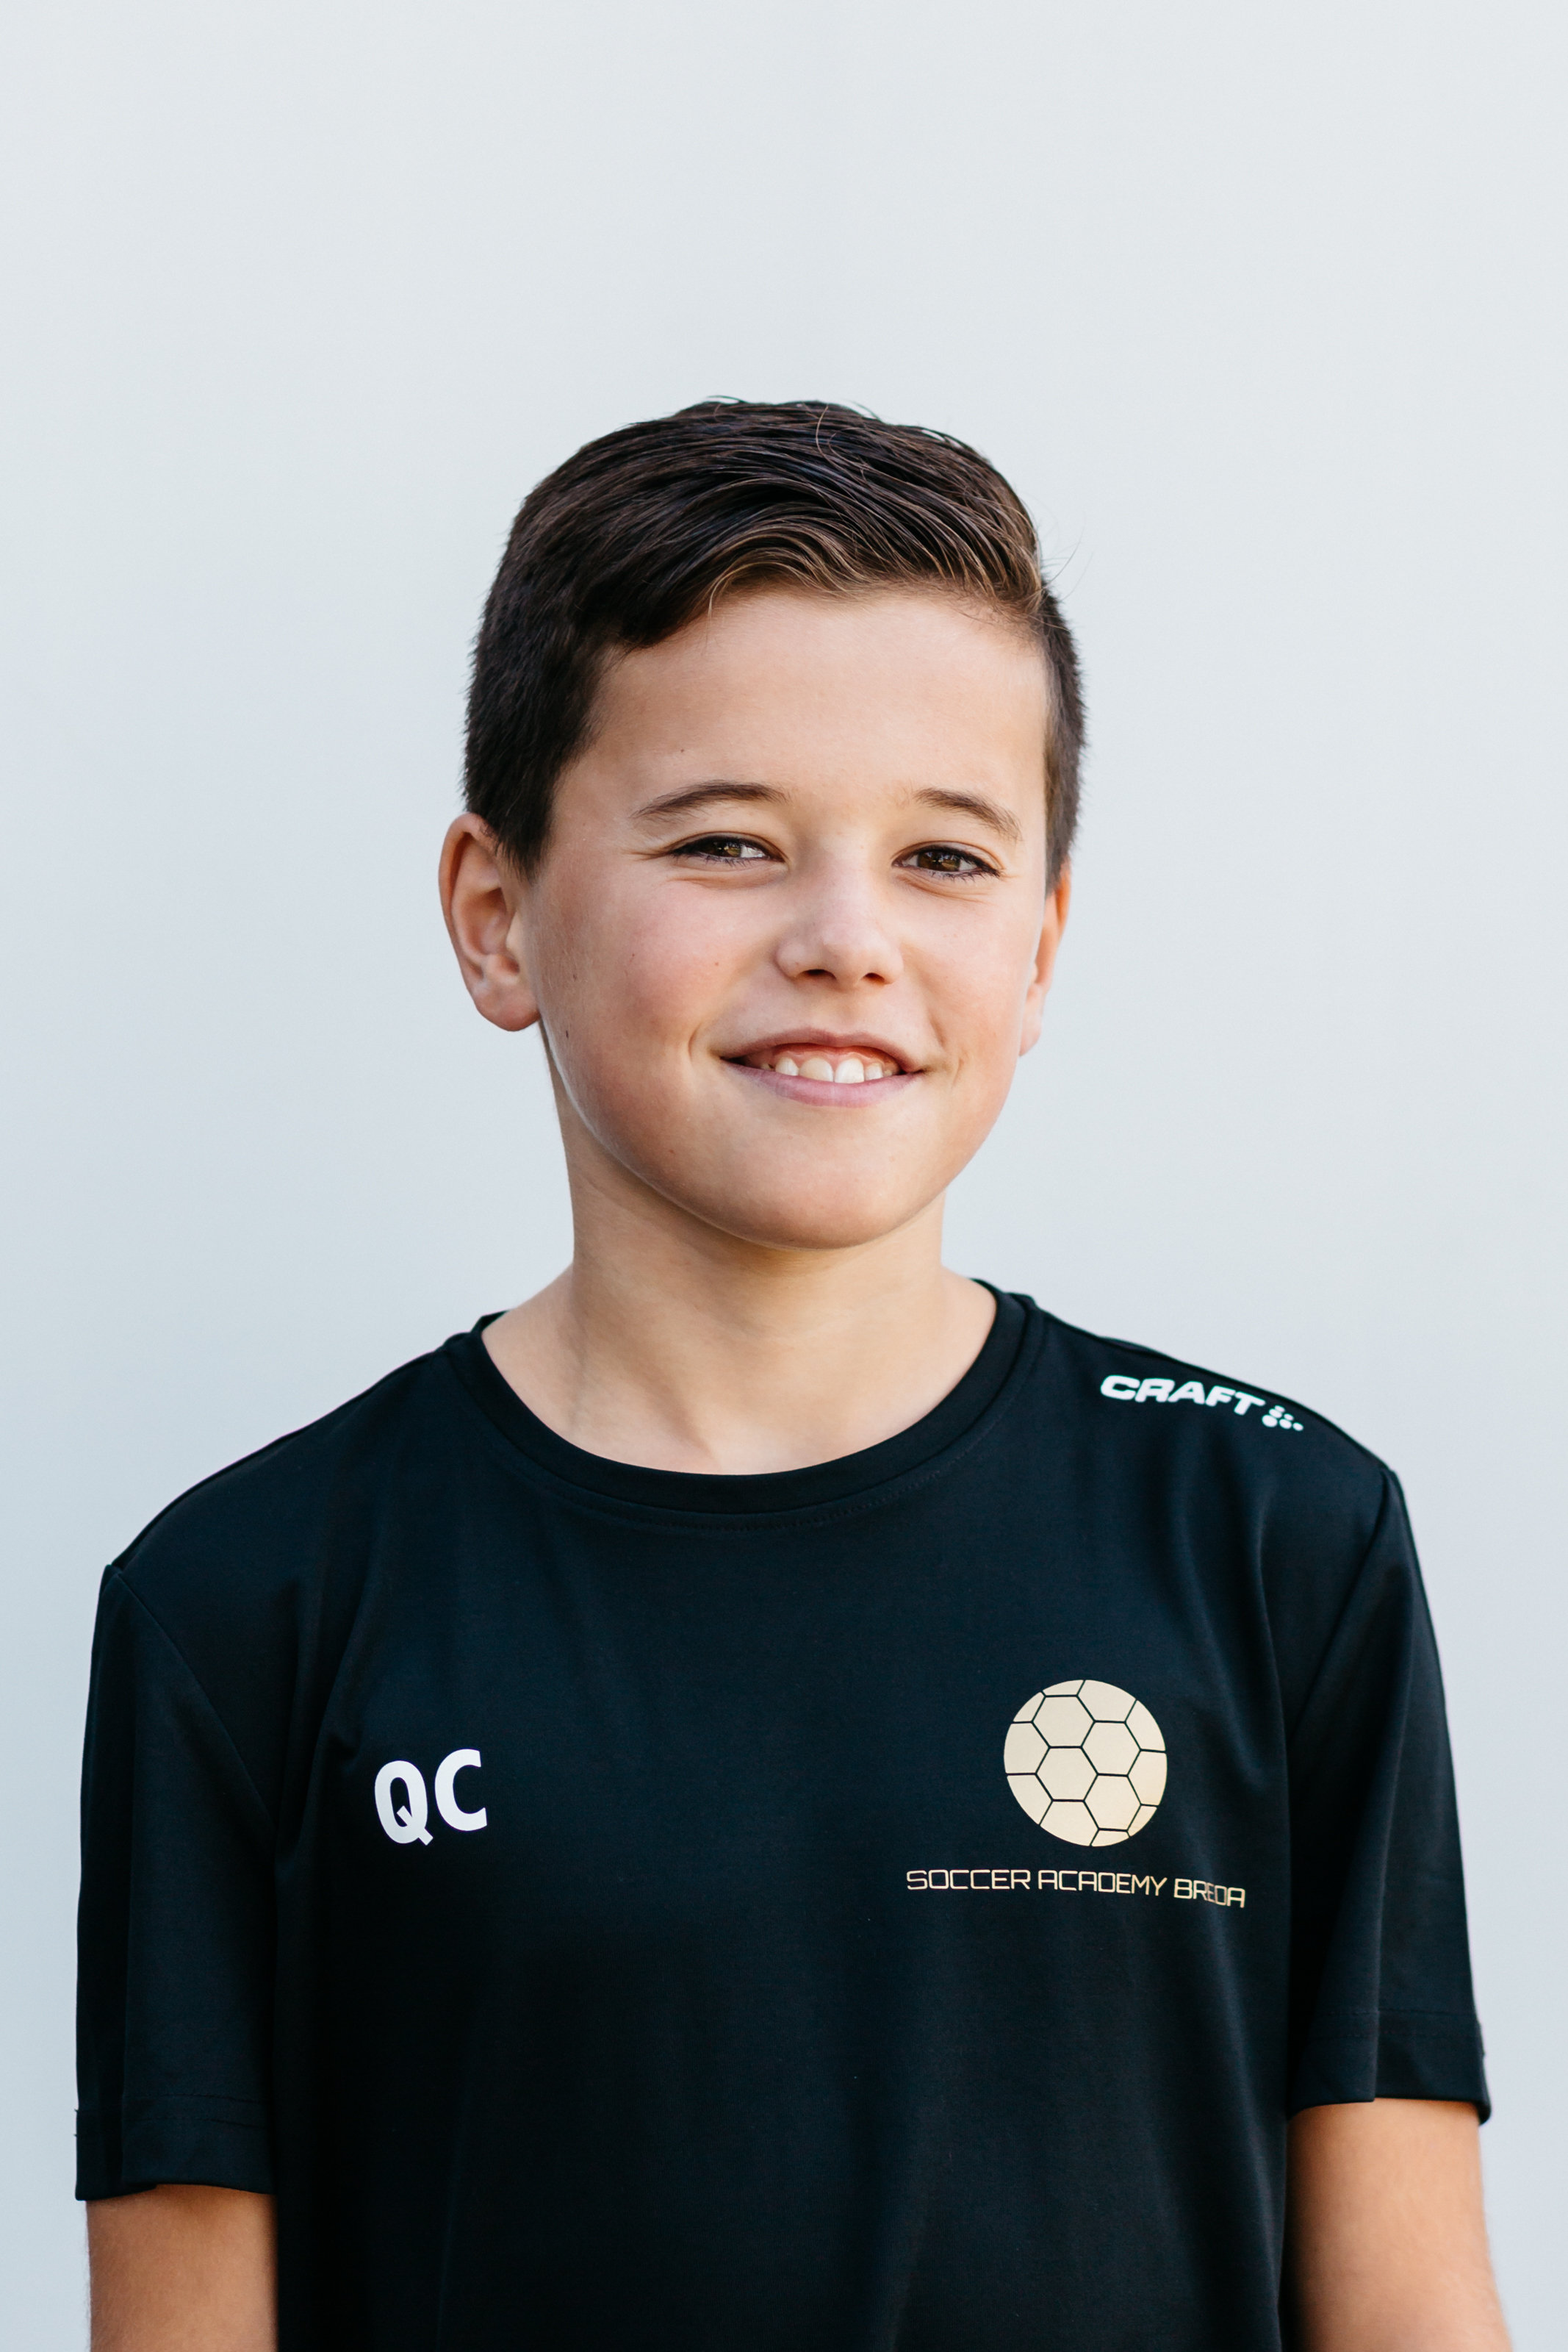 https://socceracademybreda.nl/wp-content/uploads/2020/10/quint-coester-team.jpg